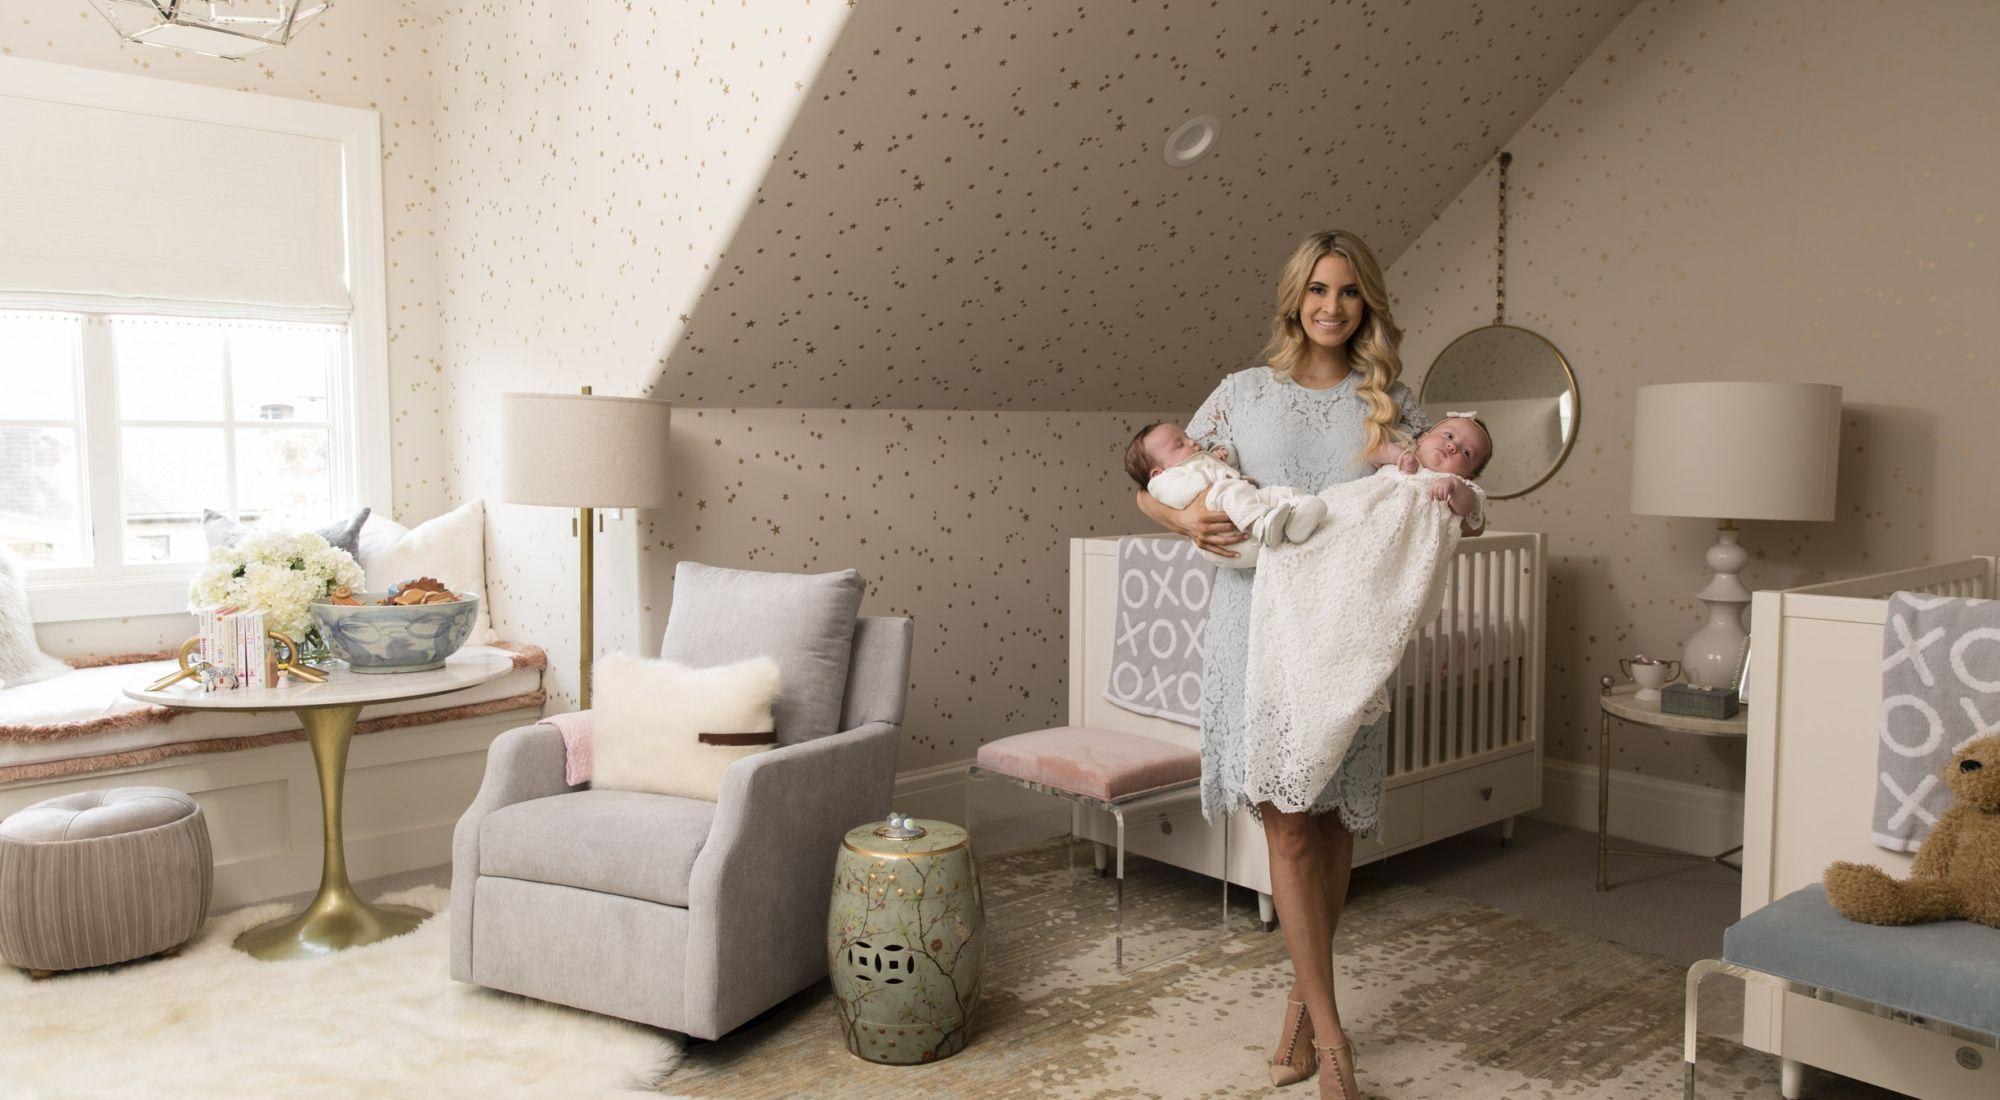 Master bedroom inspiration  Nursery Reveal  Home  Pinterest  Master bedroom and Nursery